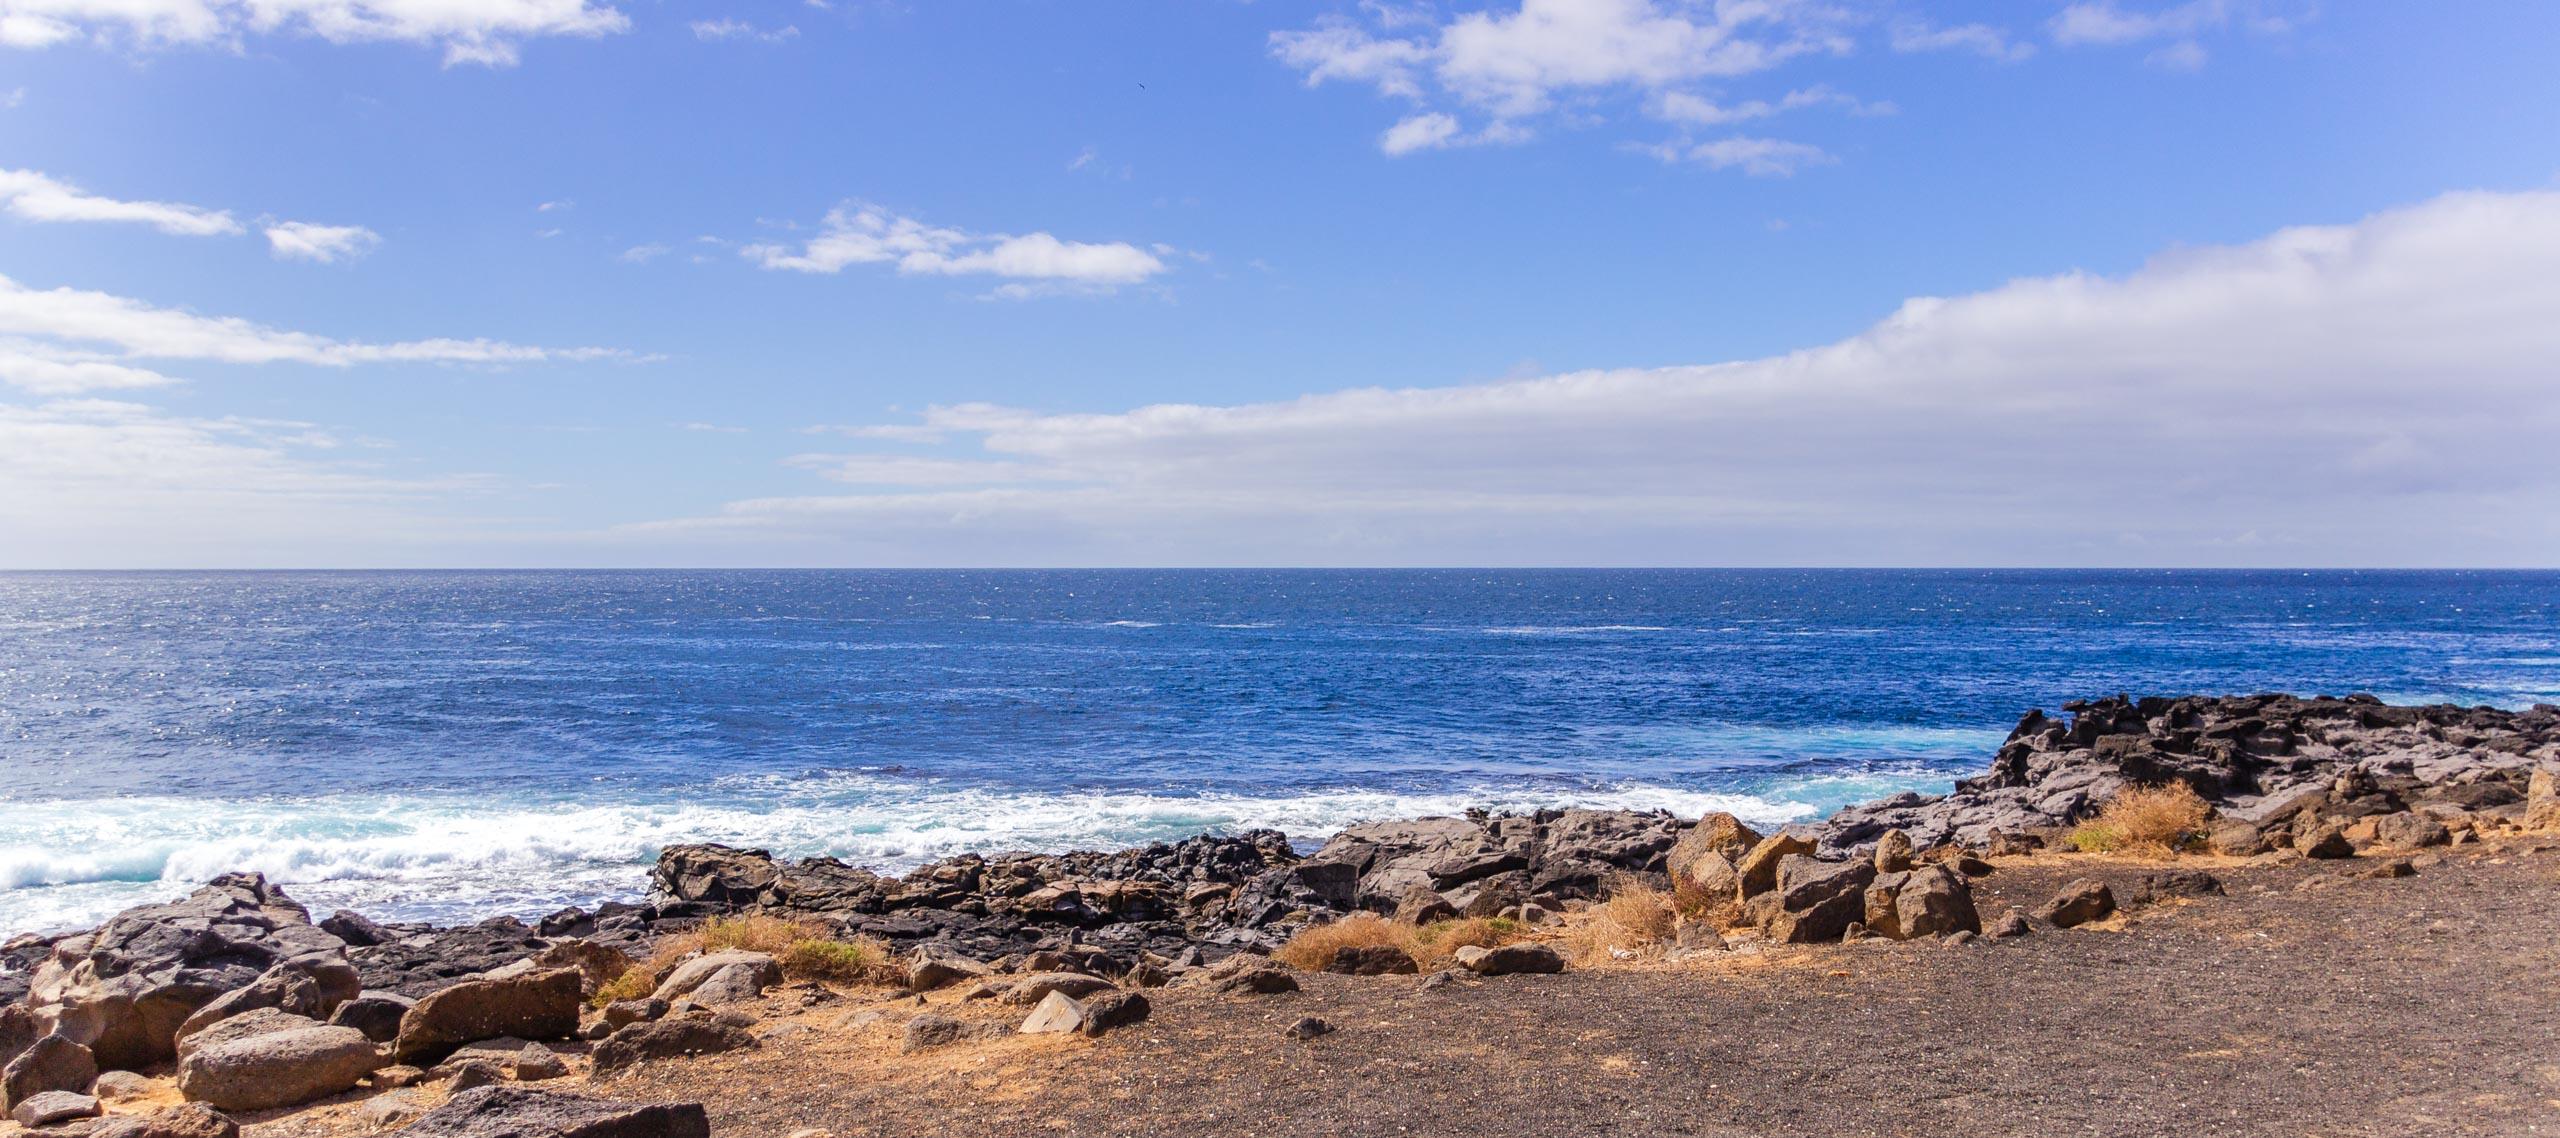 2014 02 Lanzarote PuntaPechiguera 001